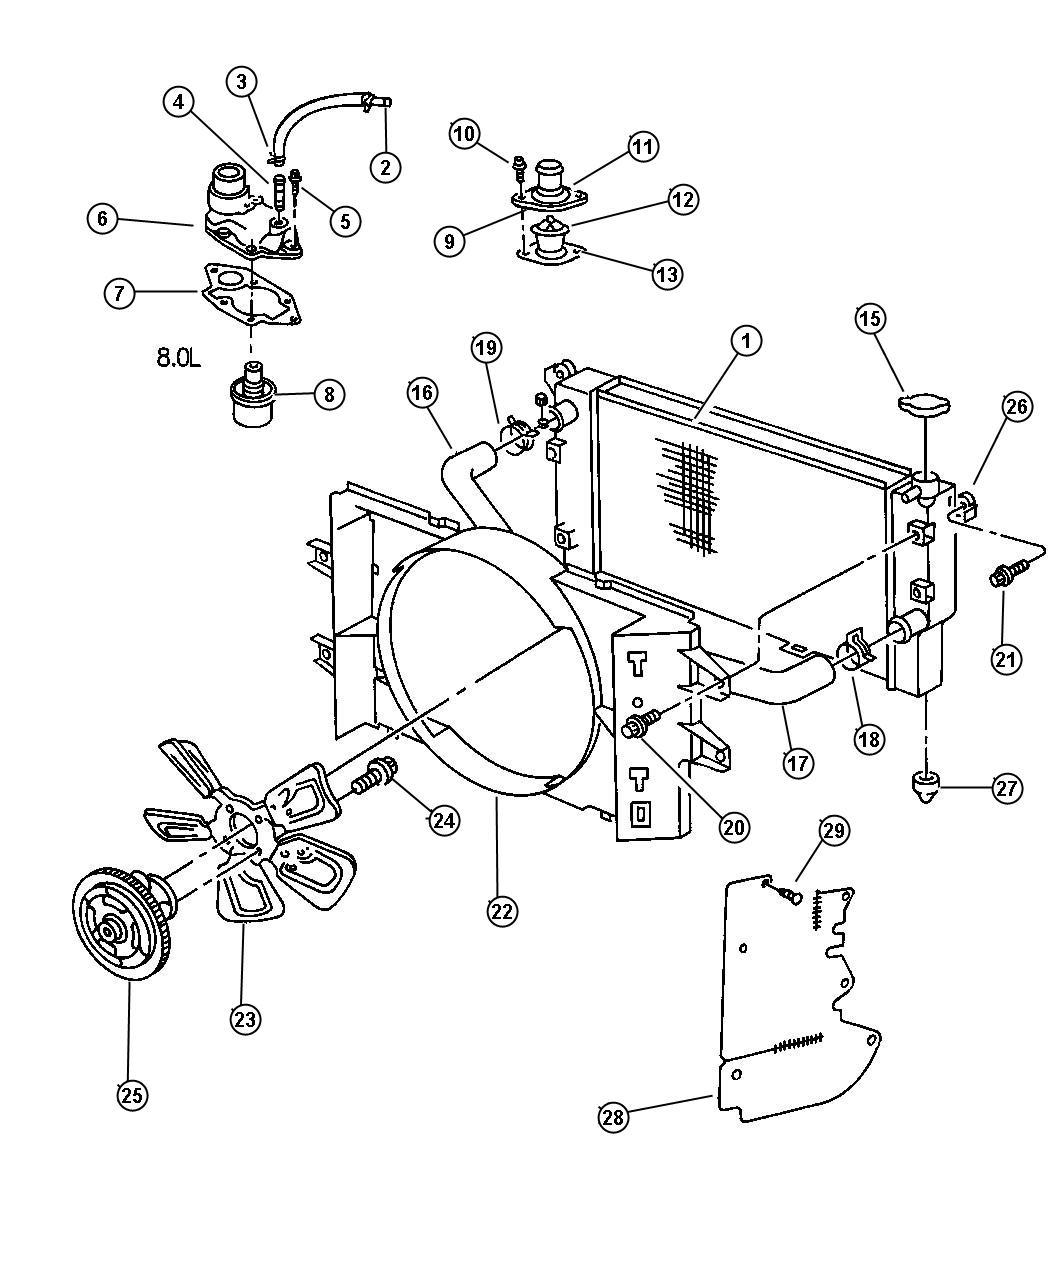 Chrysler 2005 3 8 V6 Engine Diagram Get Free Image About Wiring